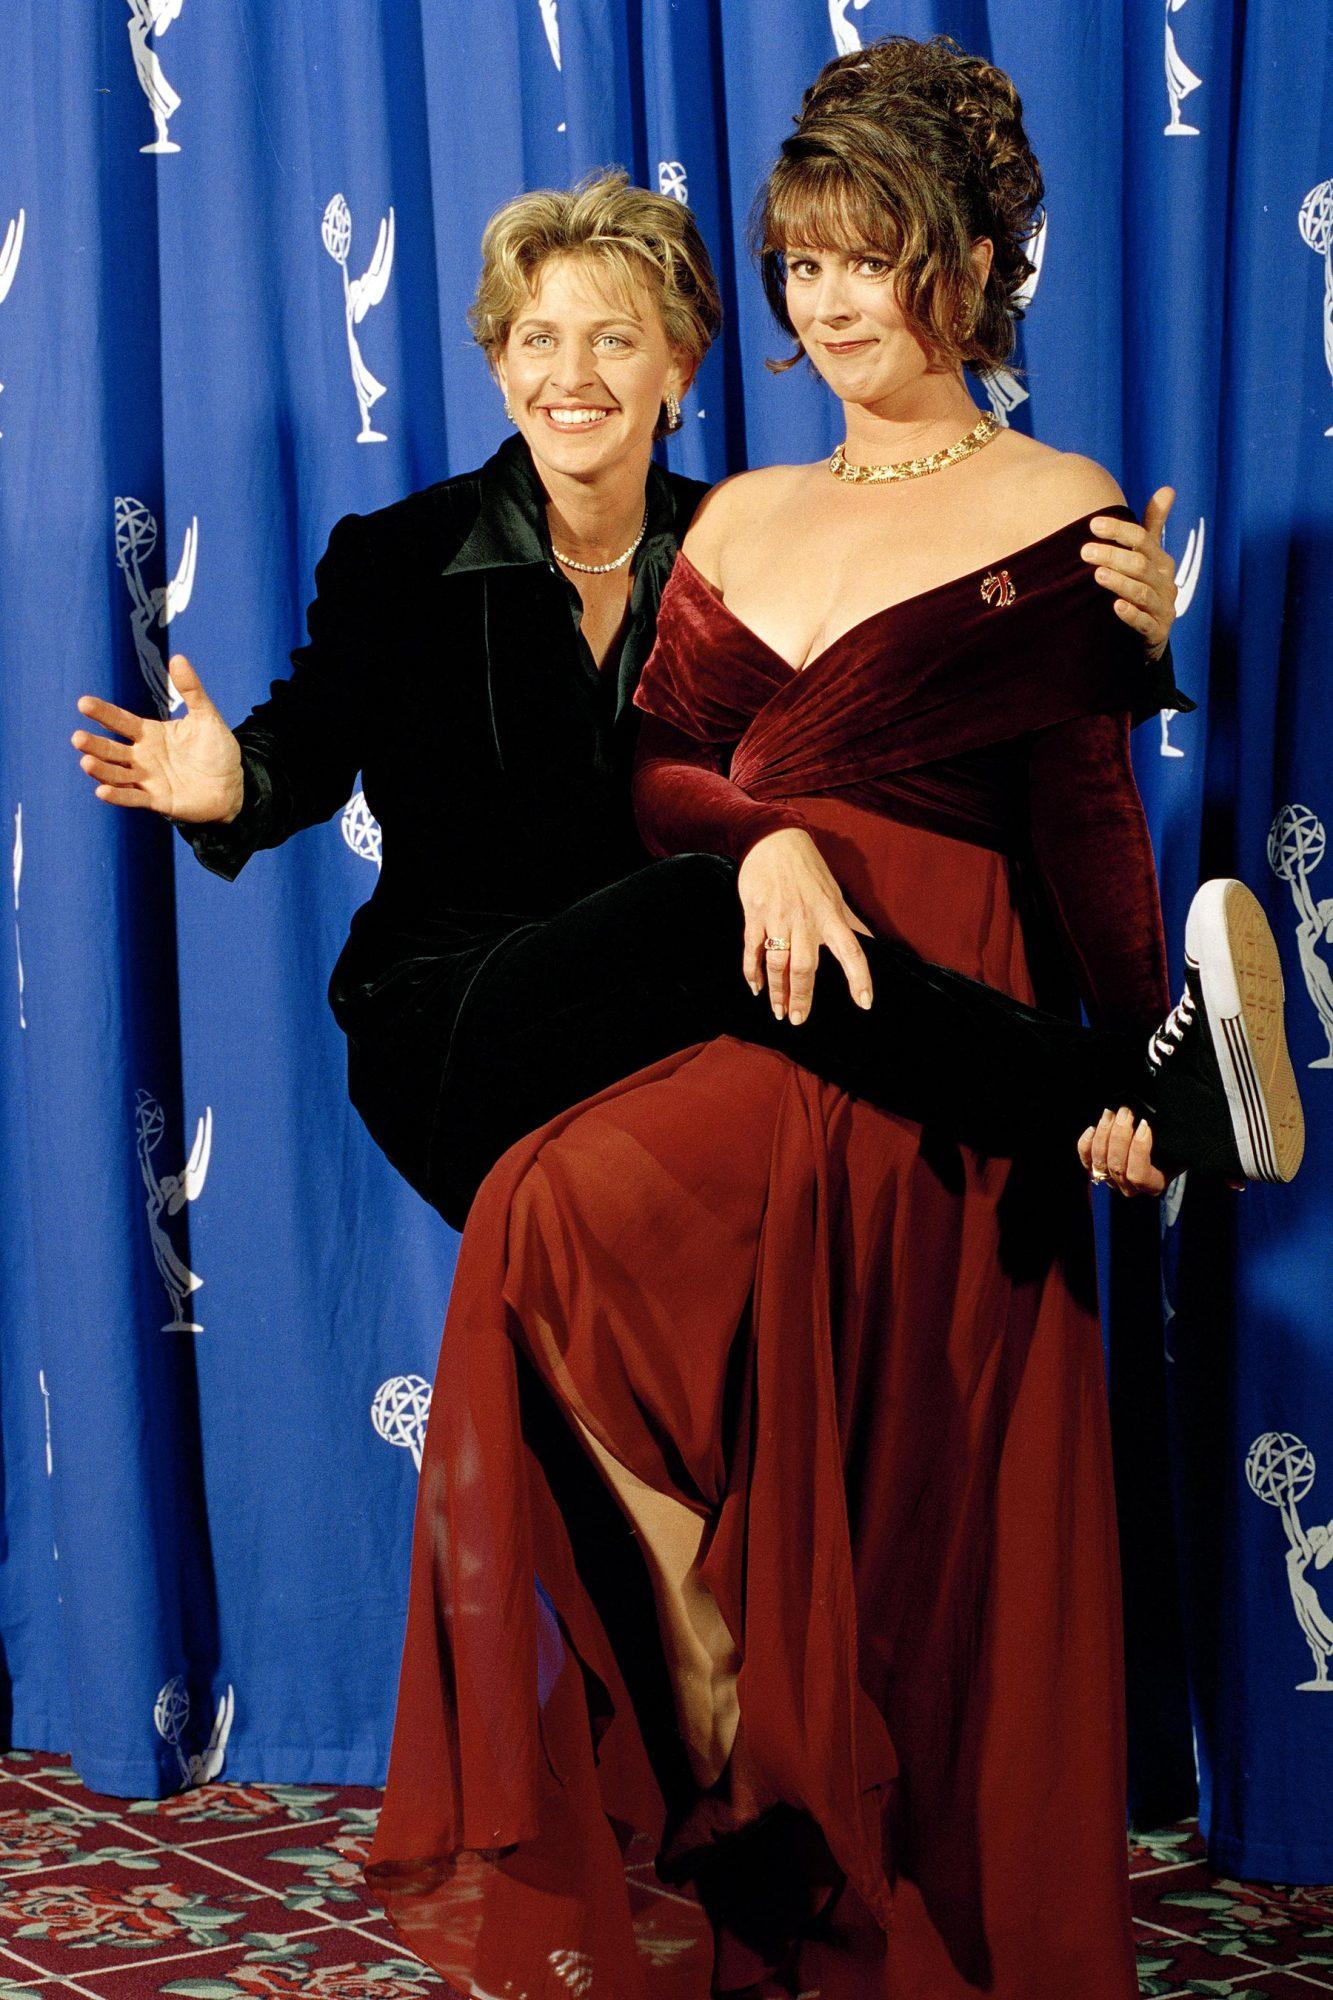 Emmys Co-Hosts DeGeneres Richardson, Pasadena, USA